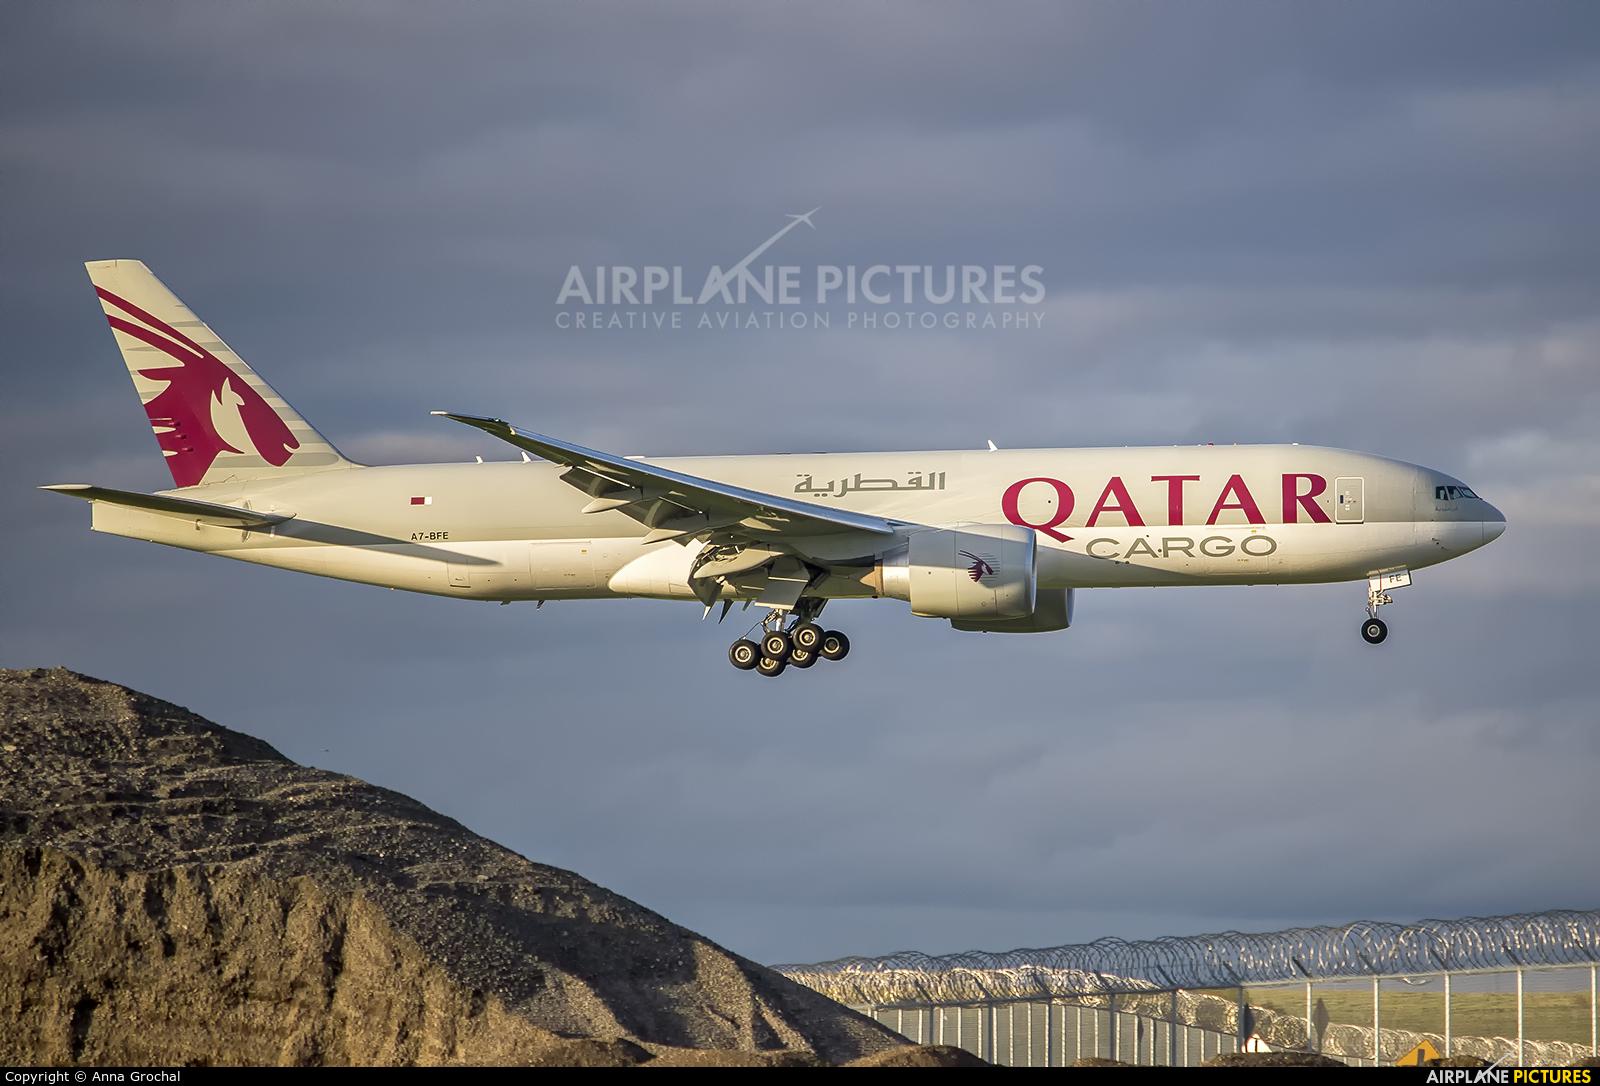 Qatar Airways Cargo A7-BFE aircraft at Chicago - O Hare Intl